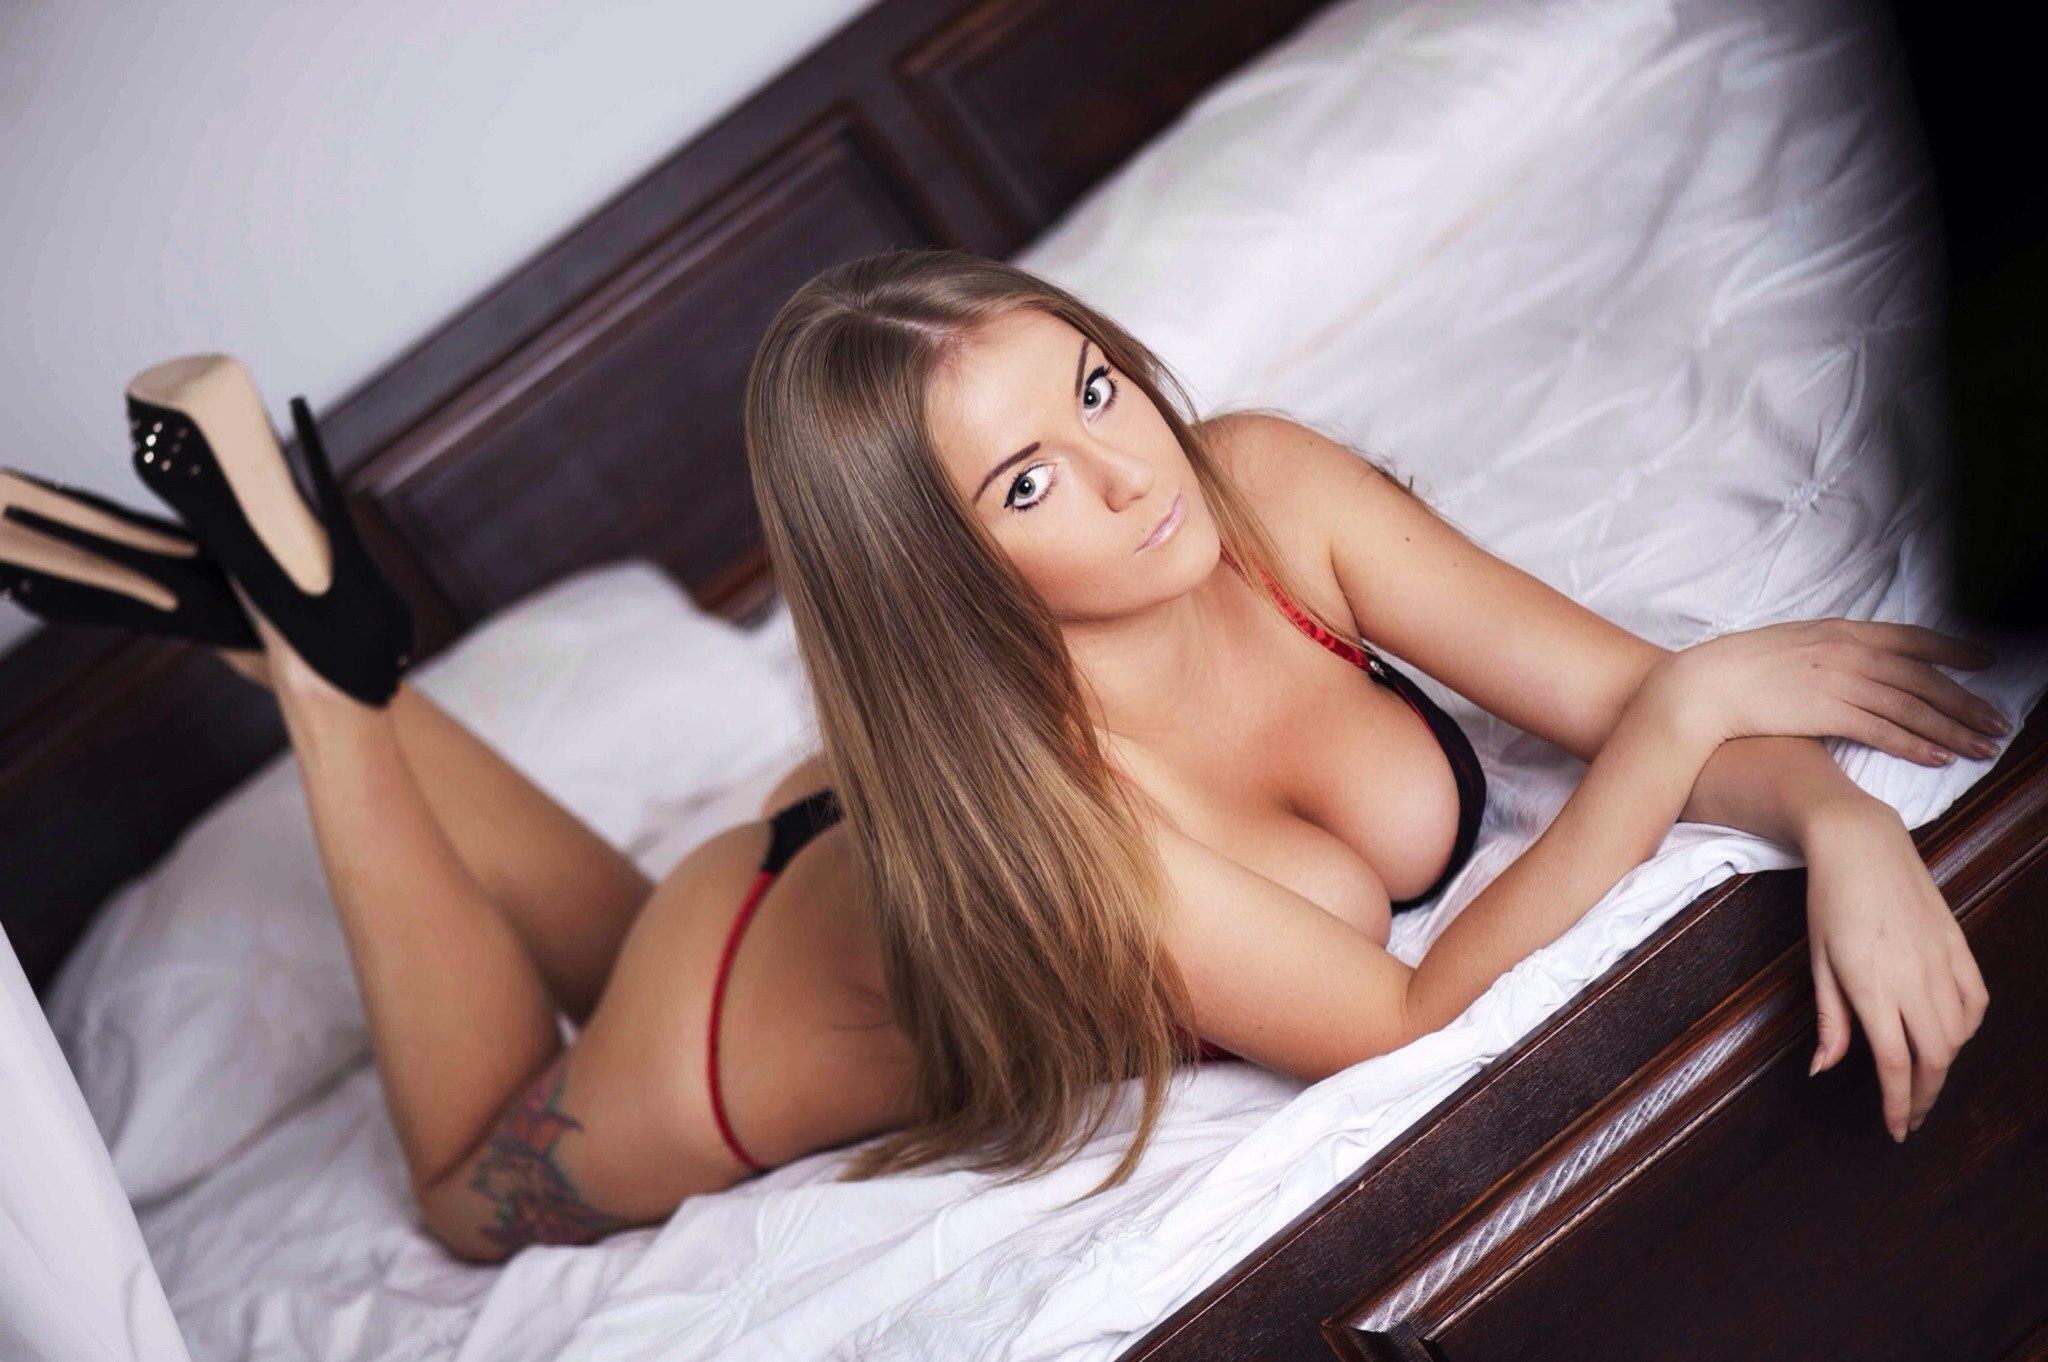 9-porno.ru Софья темникова порно фото